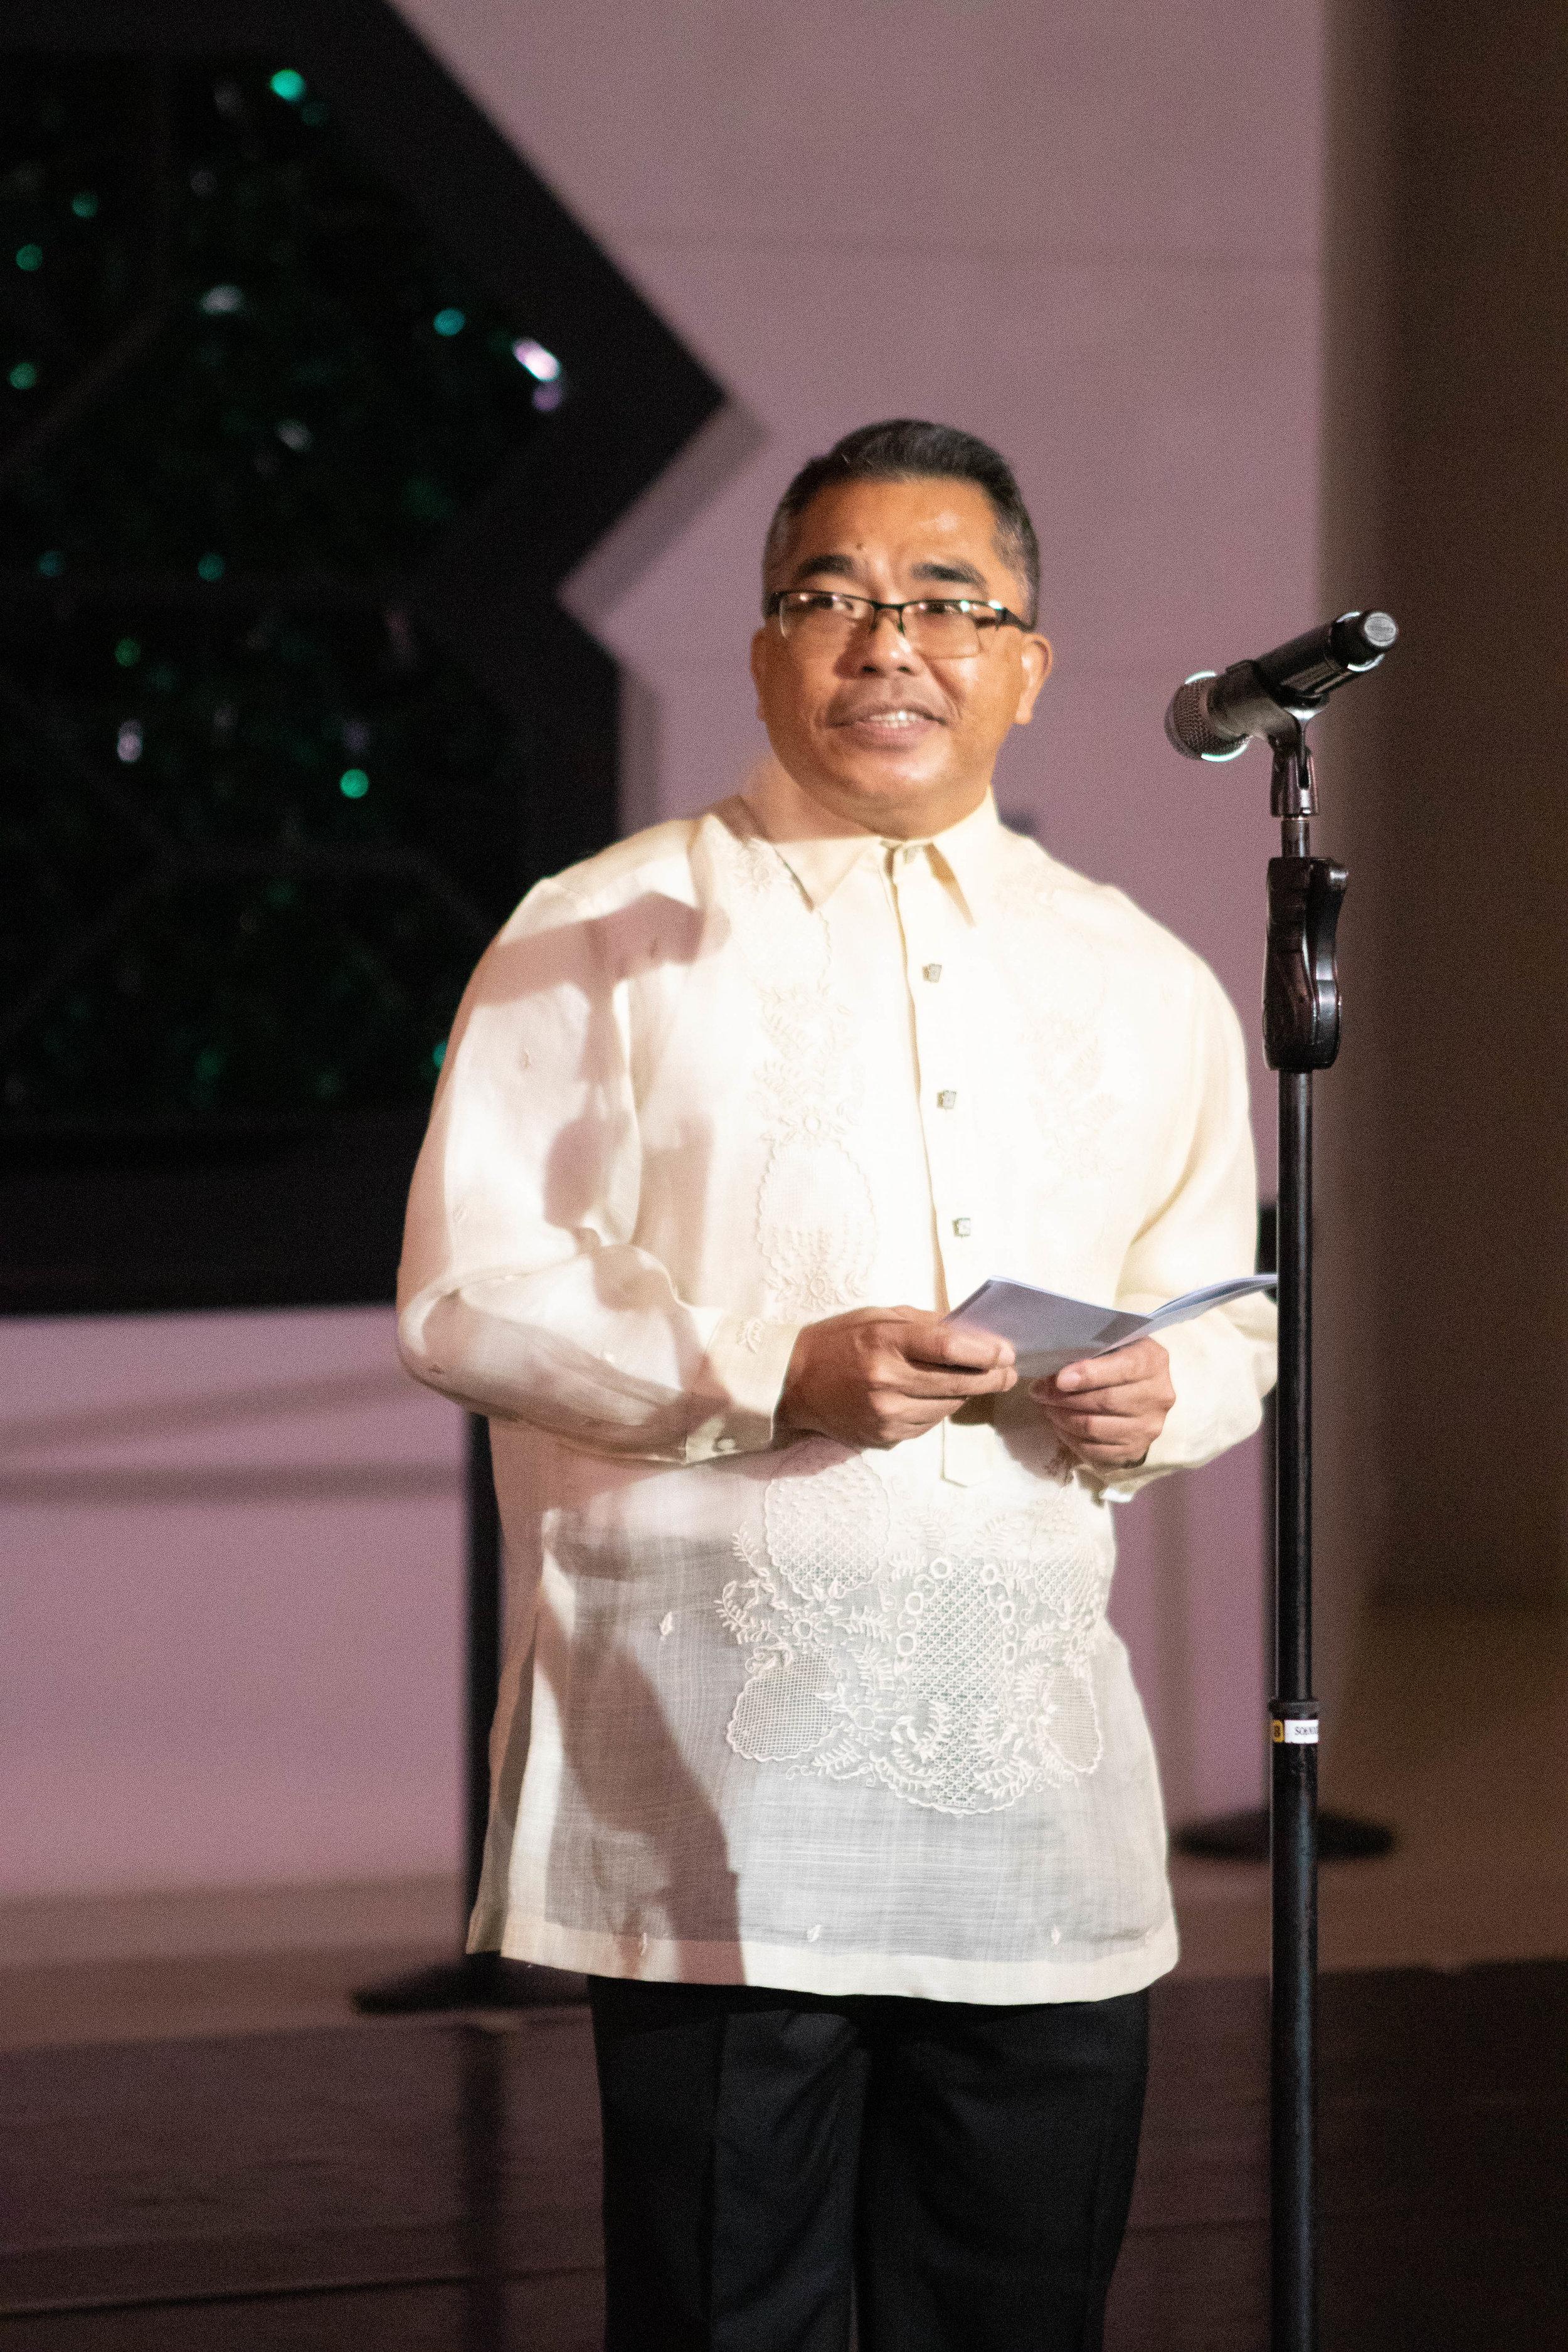 Assistant Secretary Meynardo Montealegre hosts the event.